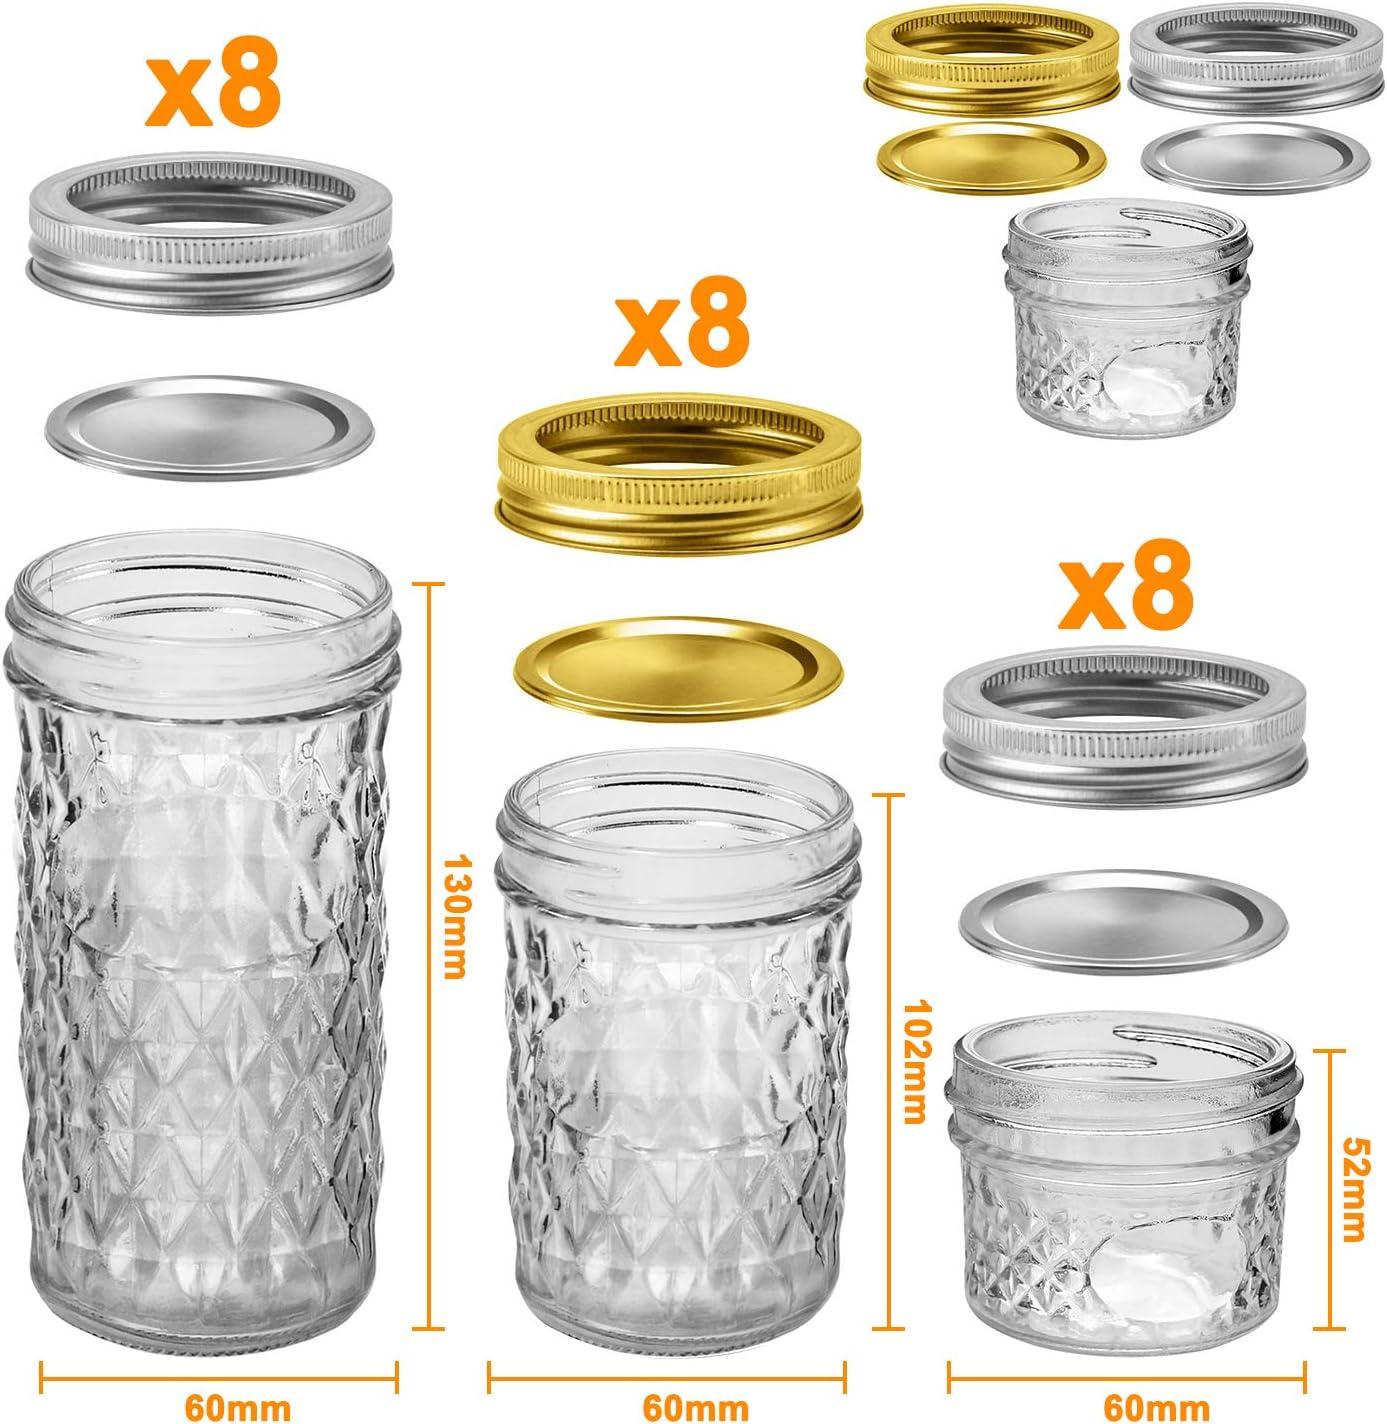 4 OZ x 4 DIY Magnetic Spice Jars Mason Jars Canning Jars 8 OZ x 4 12 OZ x 4 Wedding Favors Ideal for Jam Honey 12 Pack Glass Jars Jelly Jars With Regular Lids Shower Favors Baby Foods